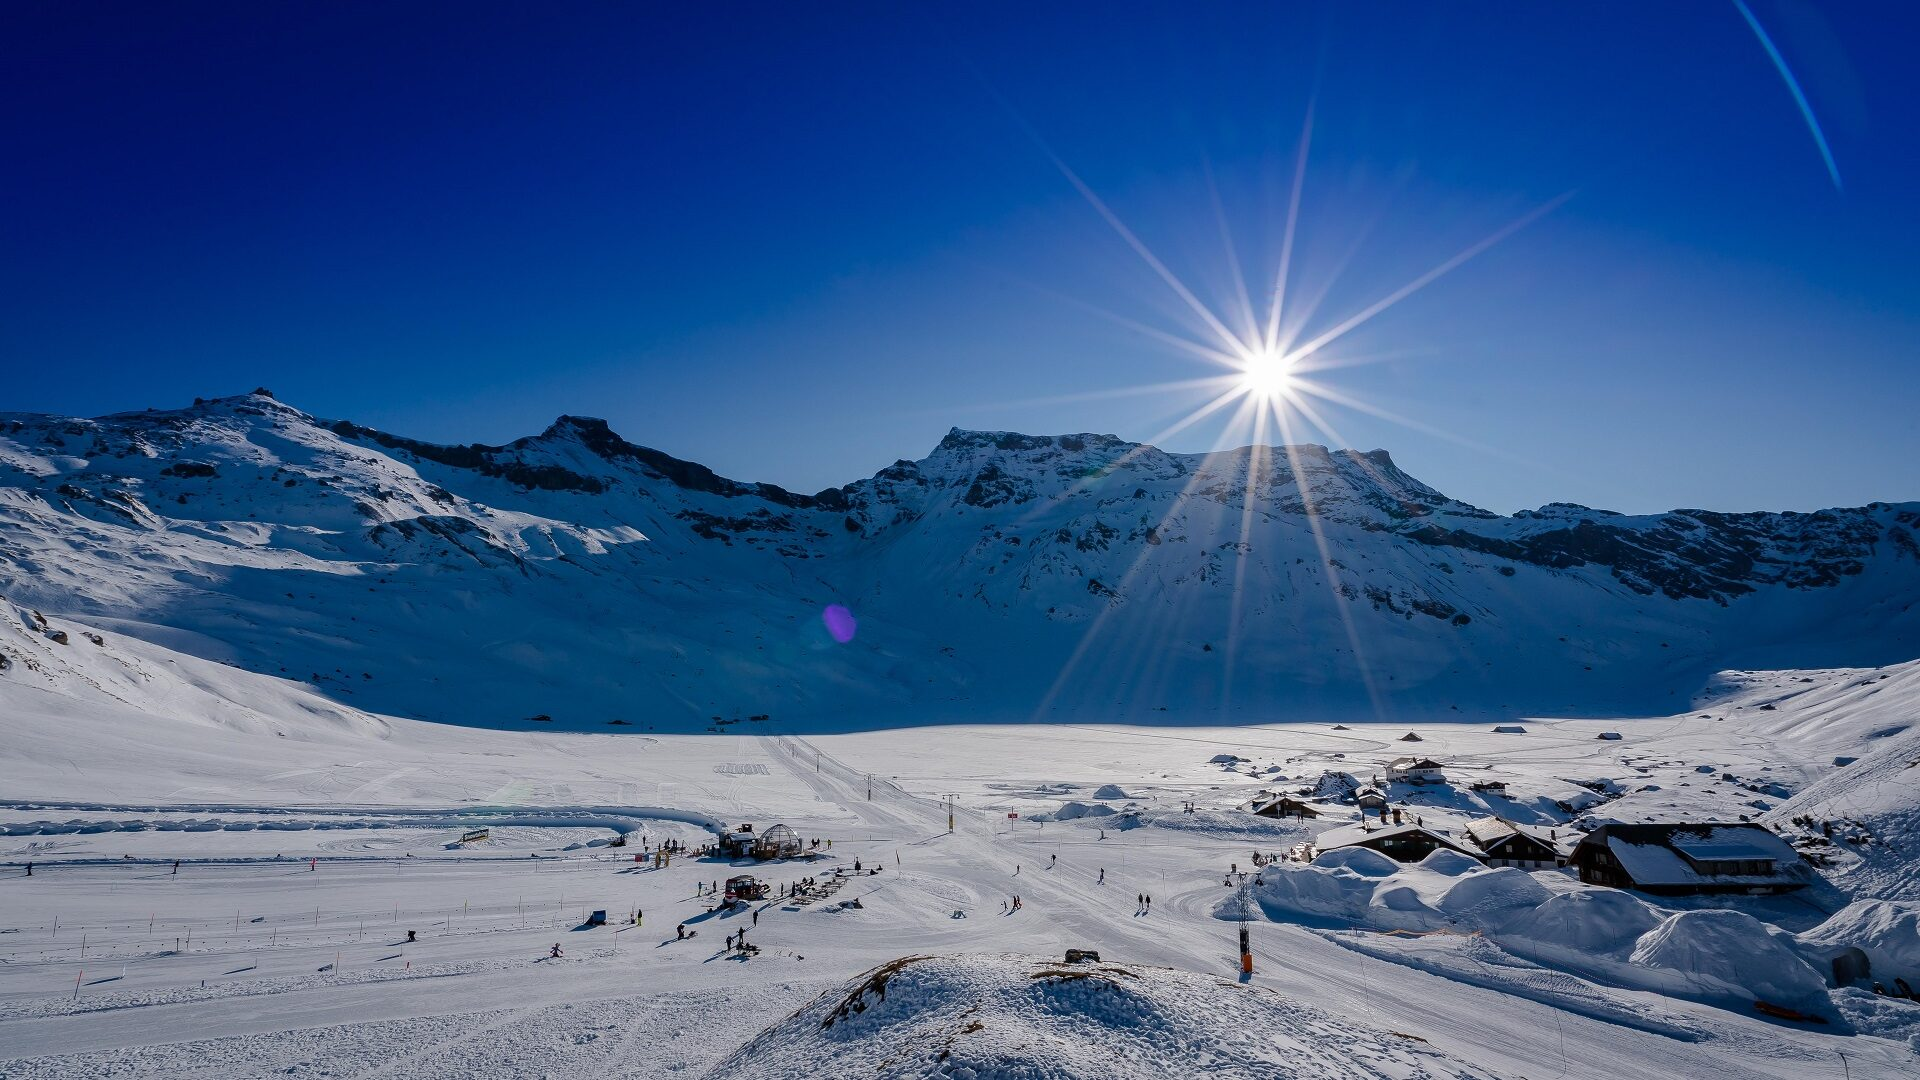 Engstligenalp im Winter